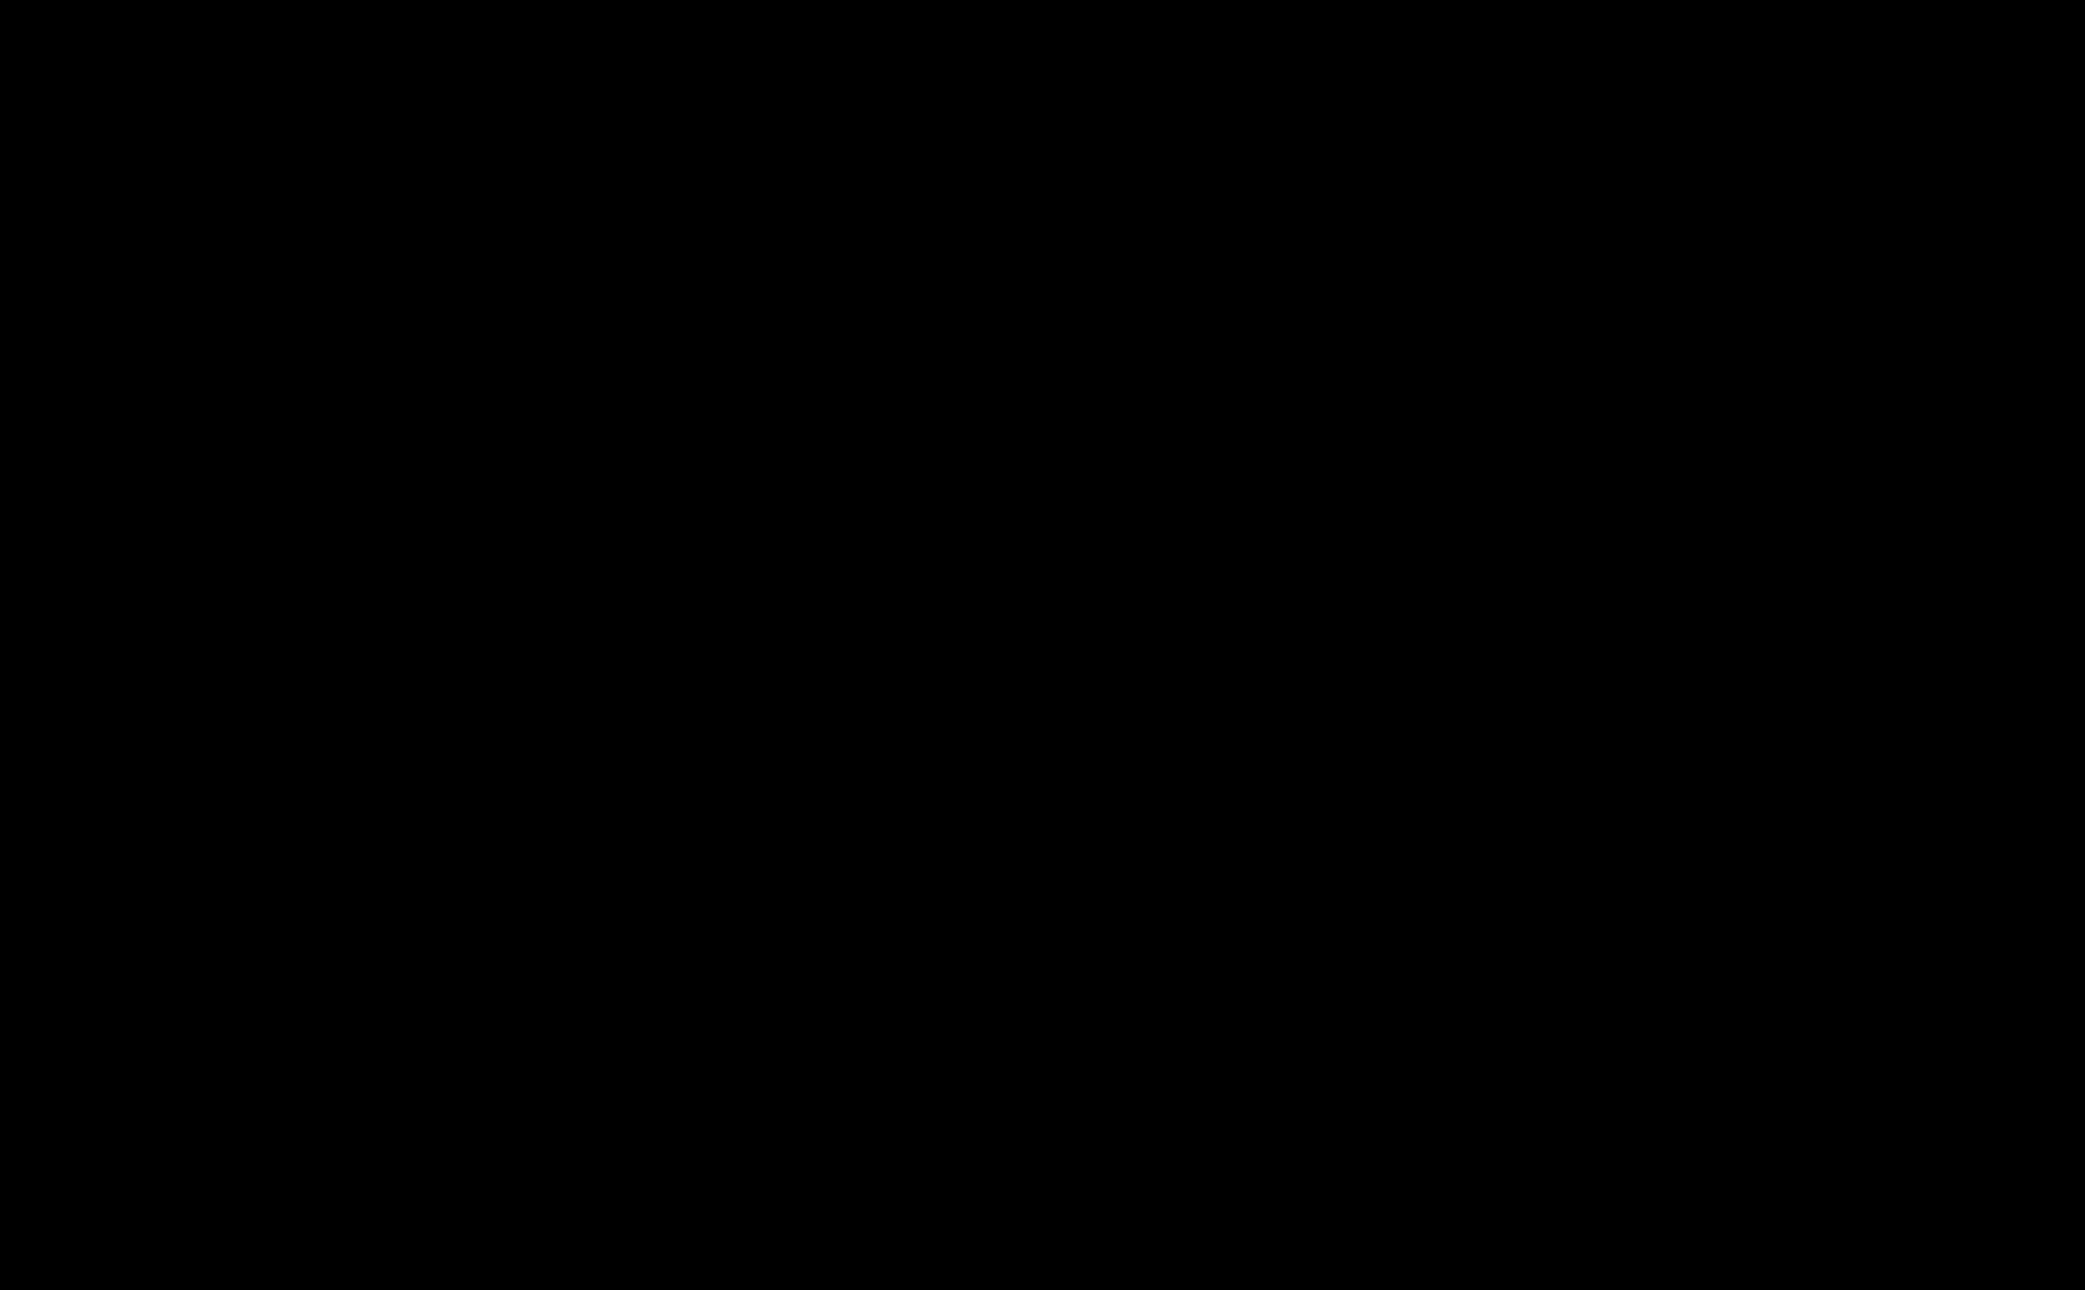 BIG IMAGE (PNG) - Mockingbird PNG HD